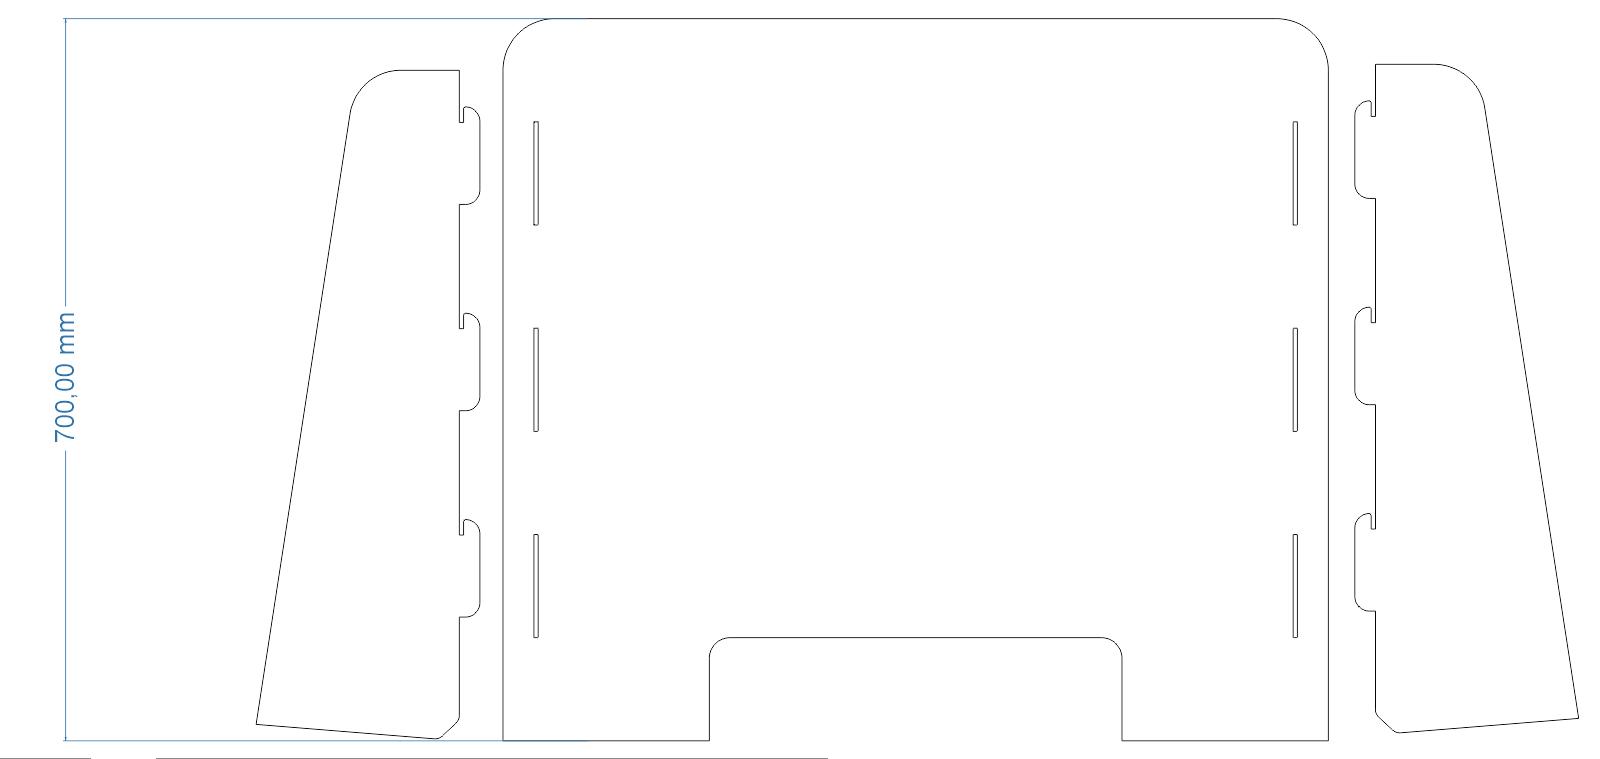 Aiyaoo Spuckschutz Plexiglas Zum H/äNgen f/ür Thekenaufsteller Thekenaufsatz virenschutz Acryl spuckschutz 30x90cm Antibakteriell Hochwertiger Hygieneschutz BxH